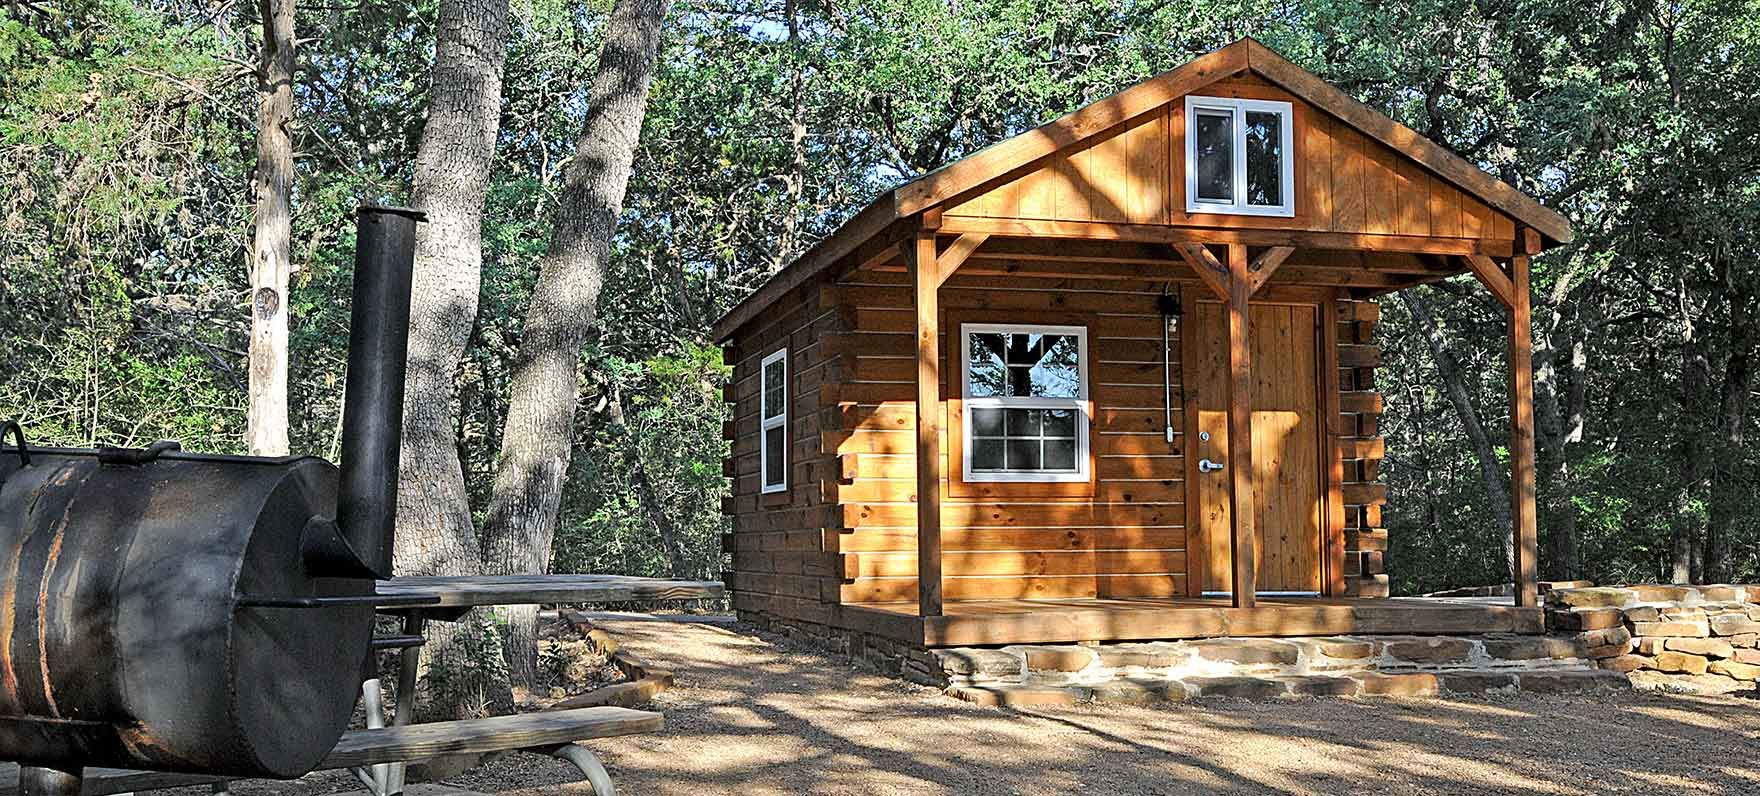 Buescher State Park Limited Use Cabins U2014 Texas Parks U0026 Wildlife Department